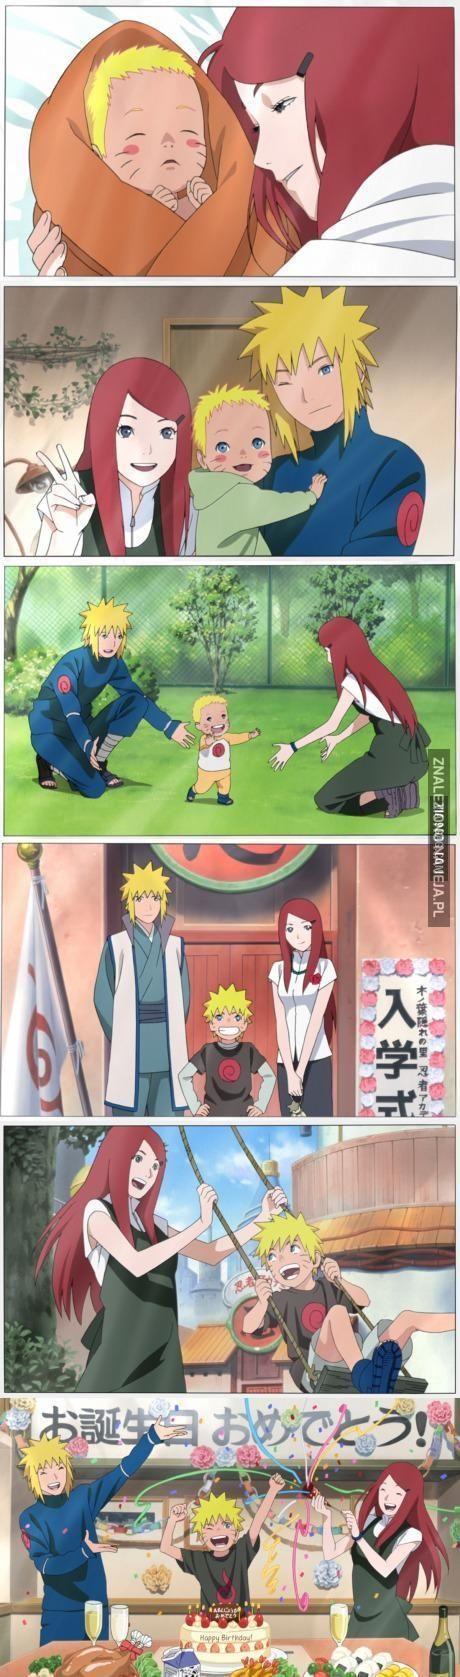 The possible life of Minato, Kushina and Naruto :( ♥♥♥ #family